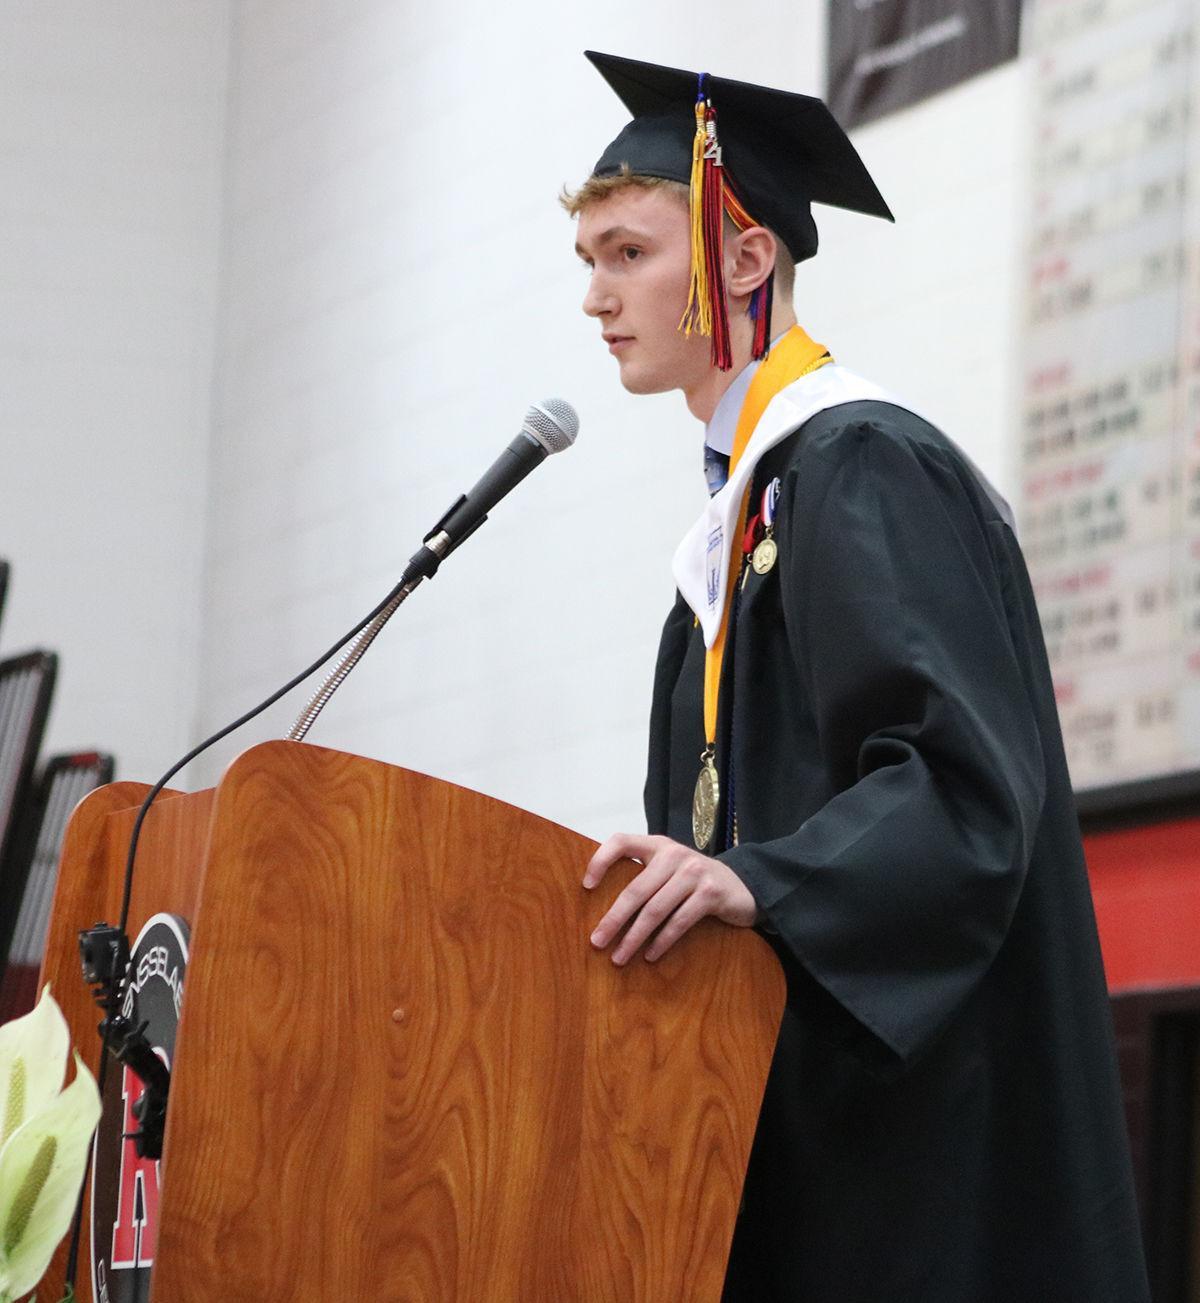 Geleott provides salutatorian speech